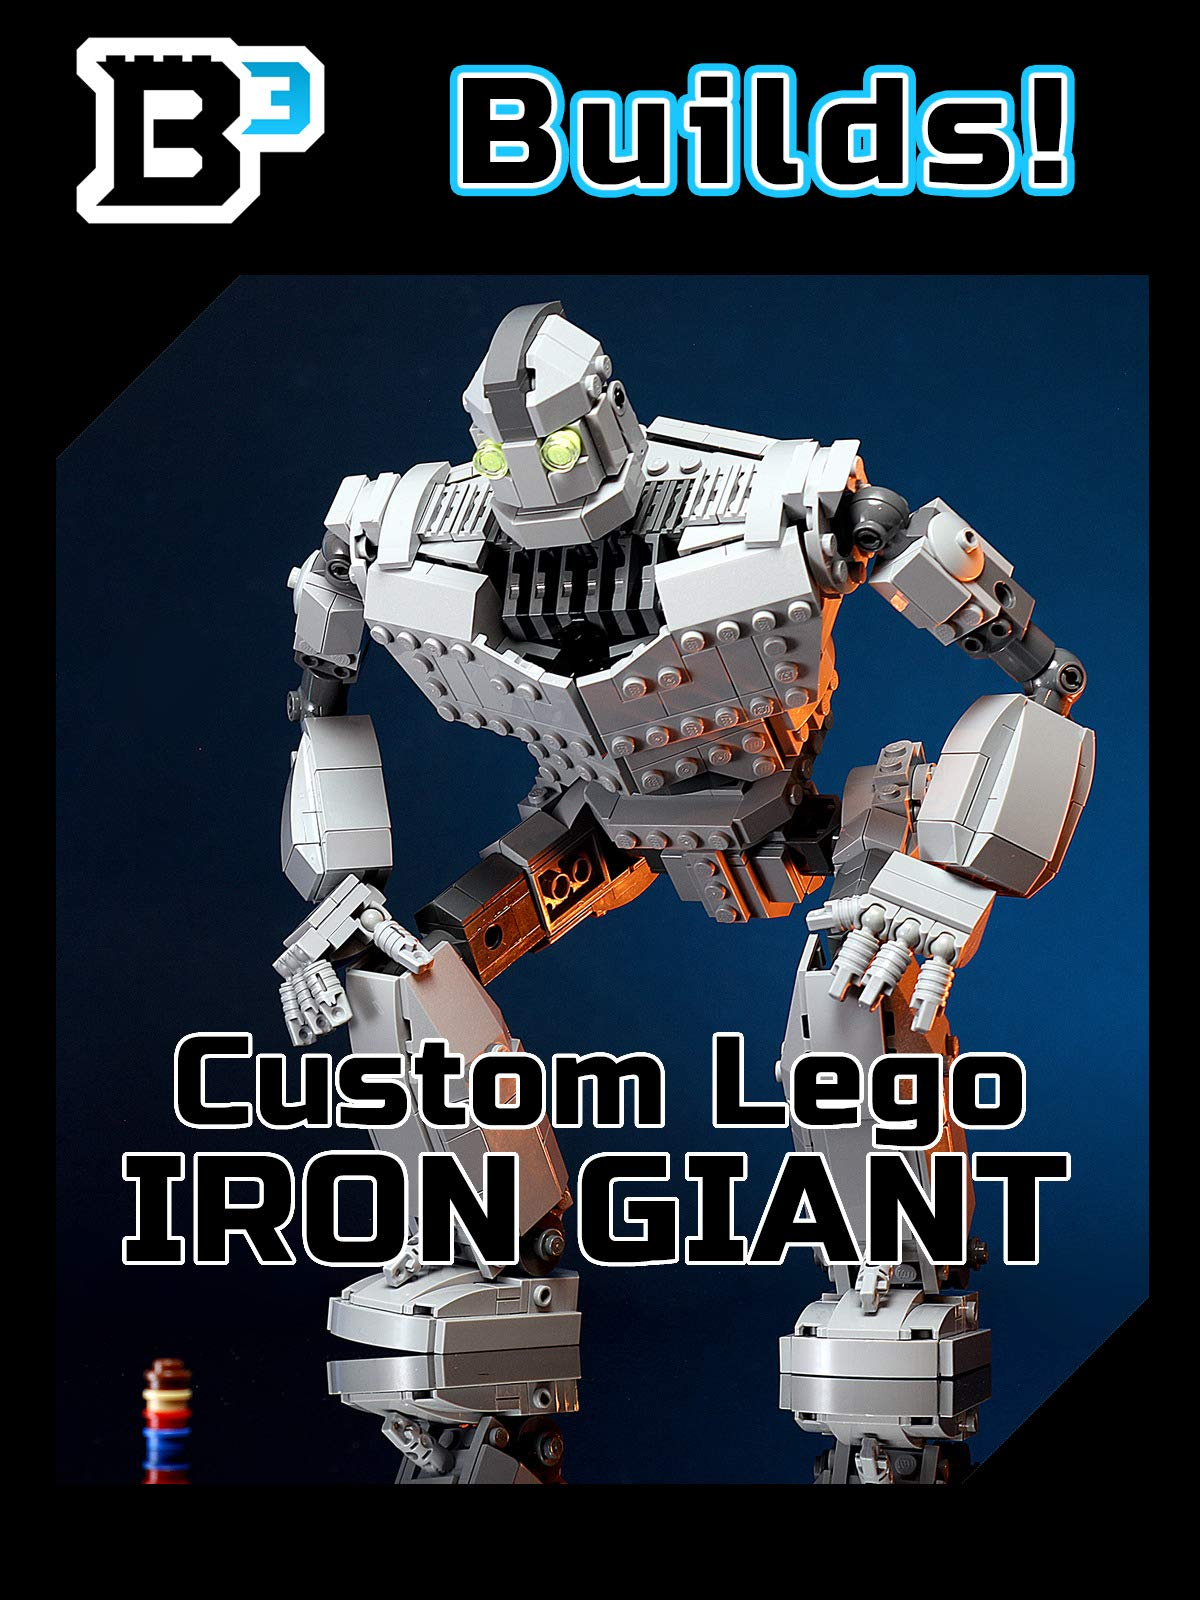 B3 Builds! Custom Lego Iron Giant